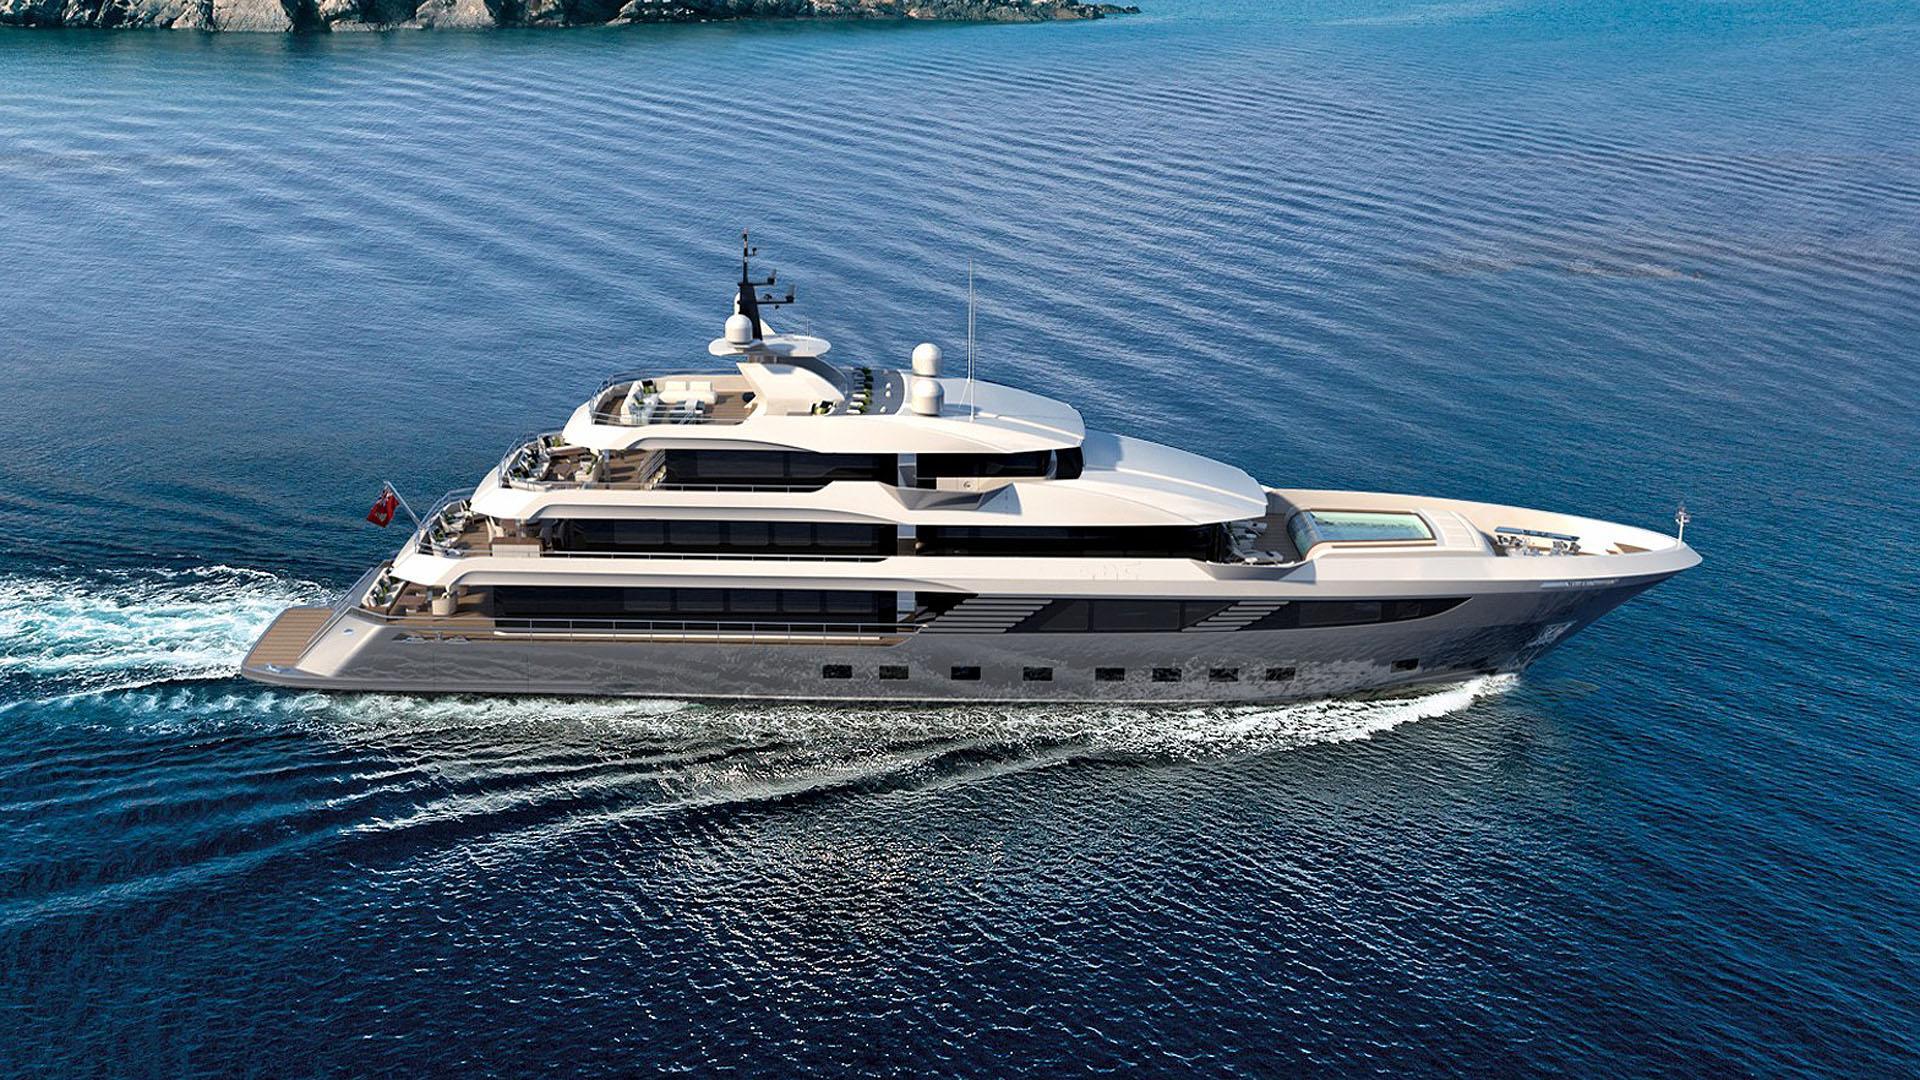 majesty 175 motoryacht gulf craft 53m 2019 rendering profile